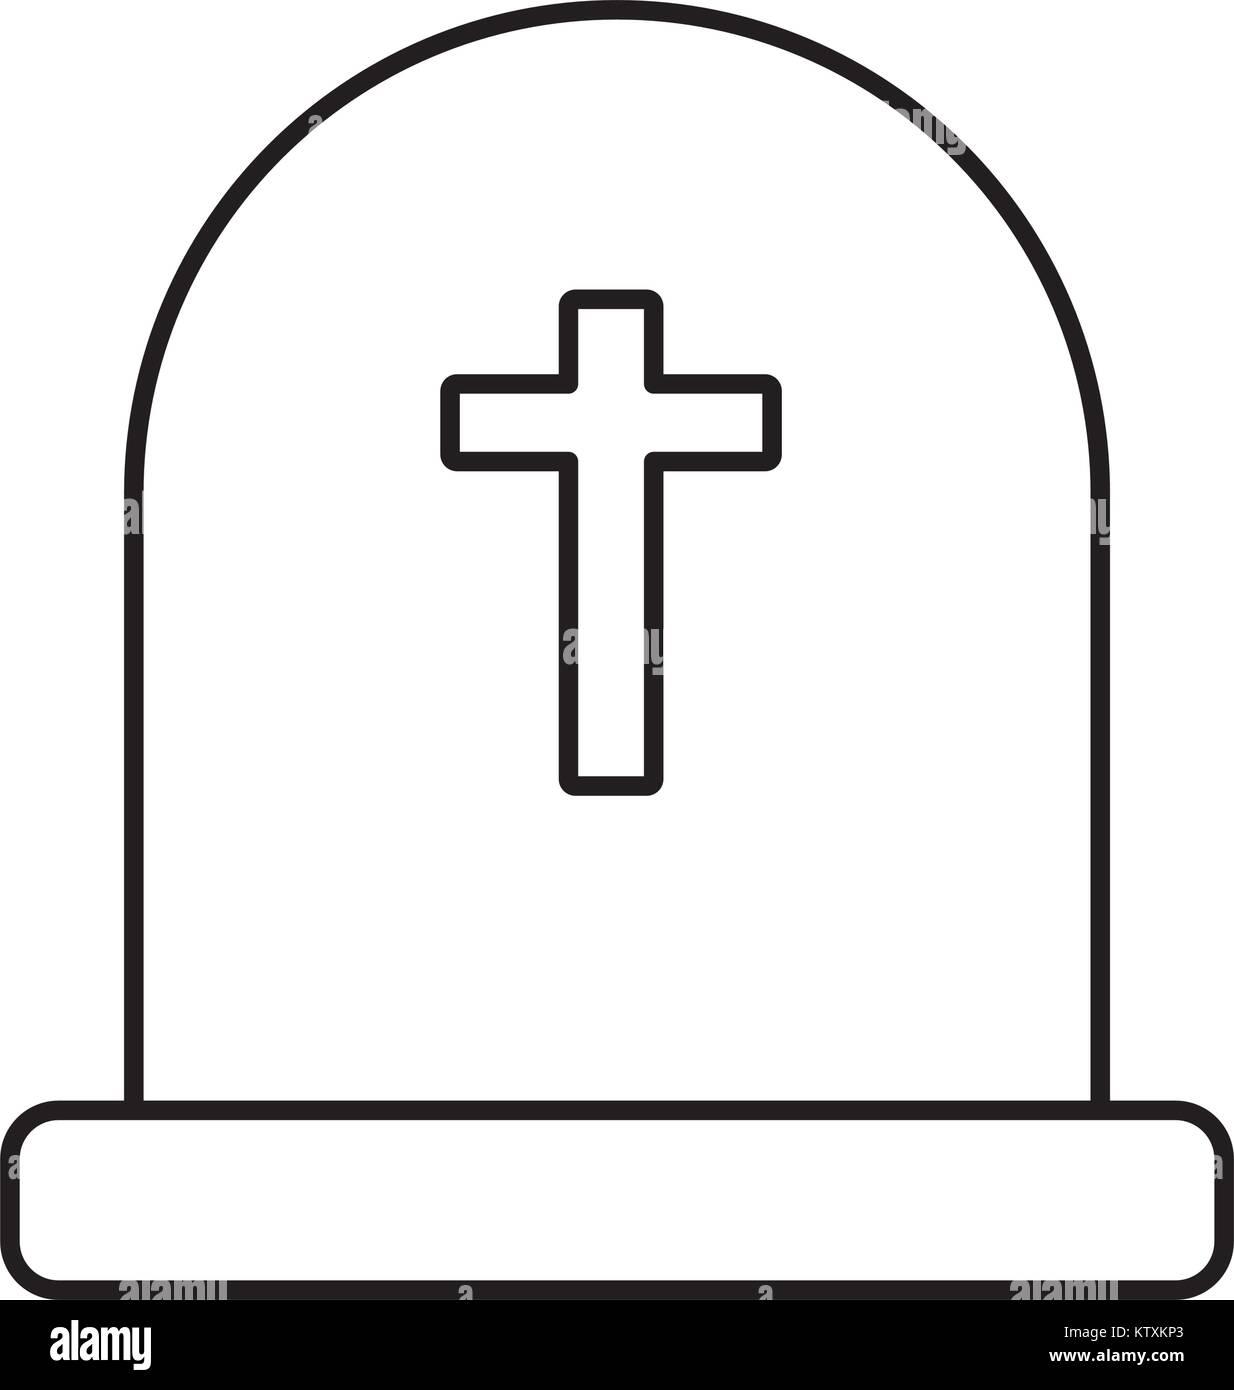 Cemetery tombstone isolated - Stock Vector